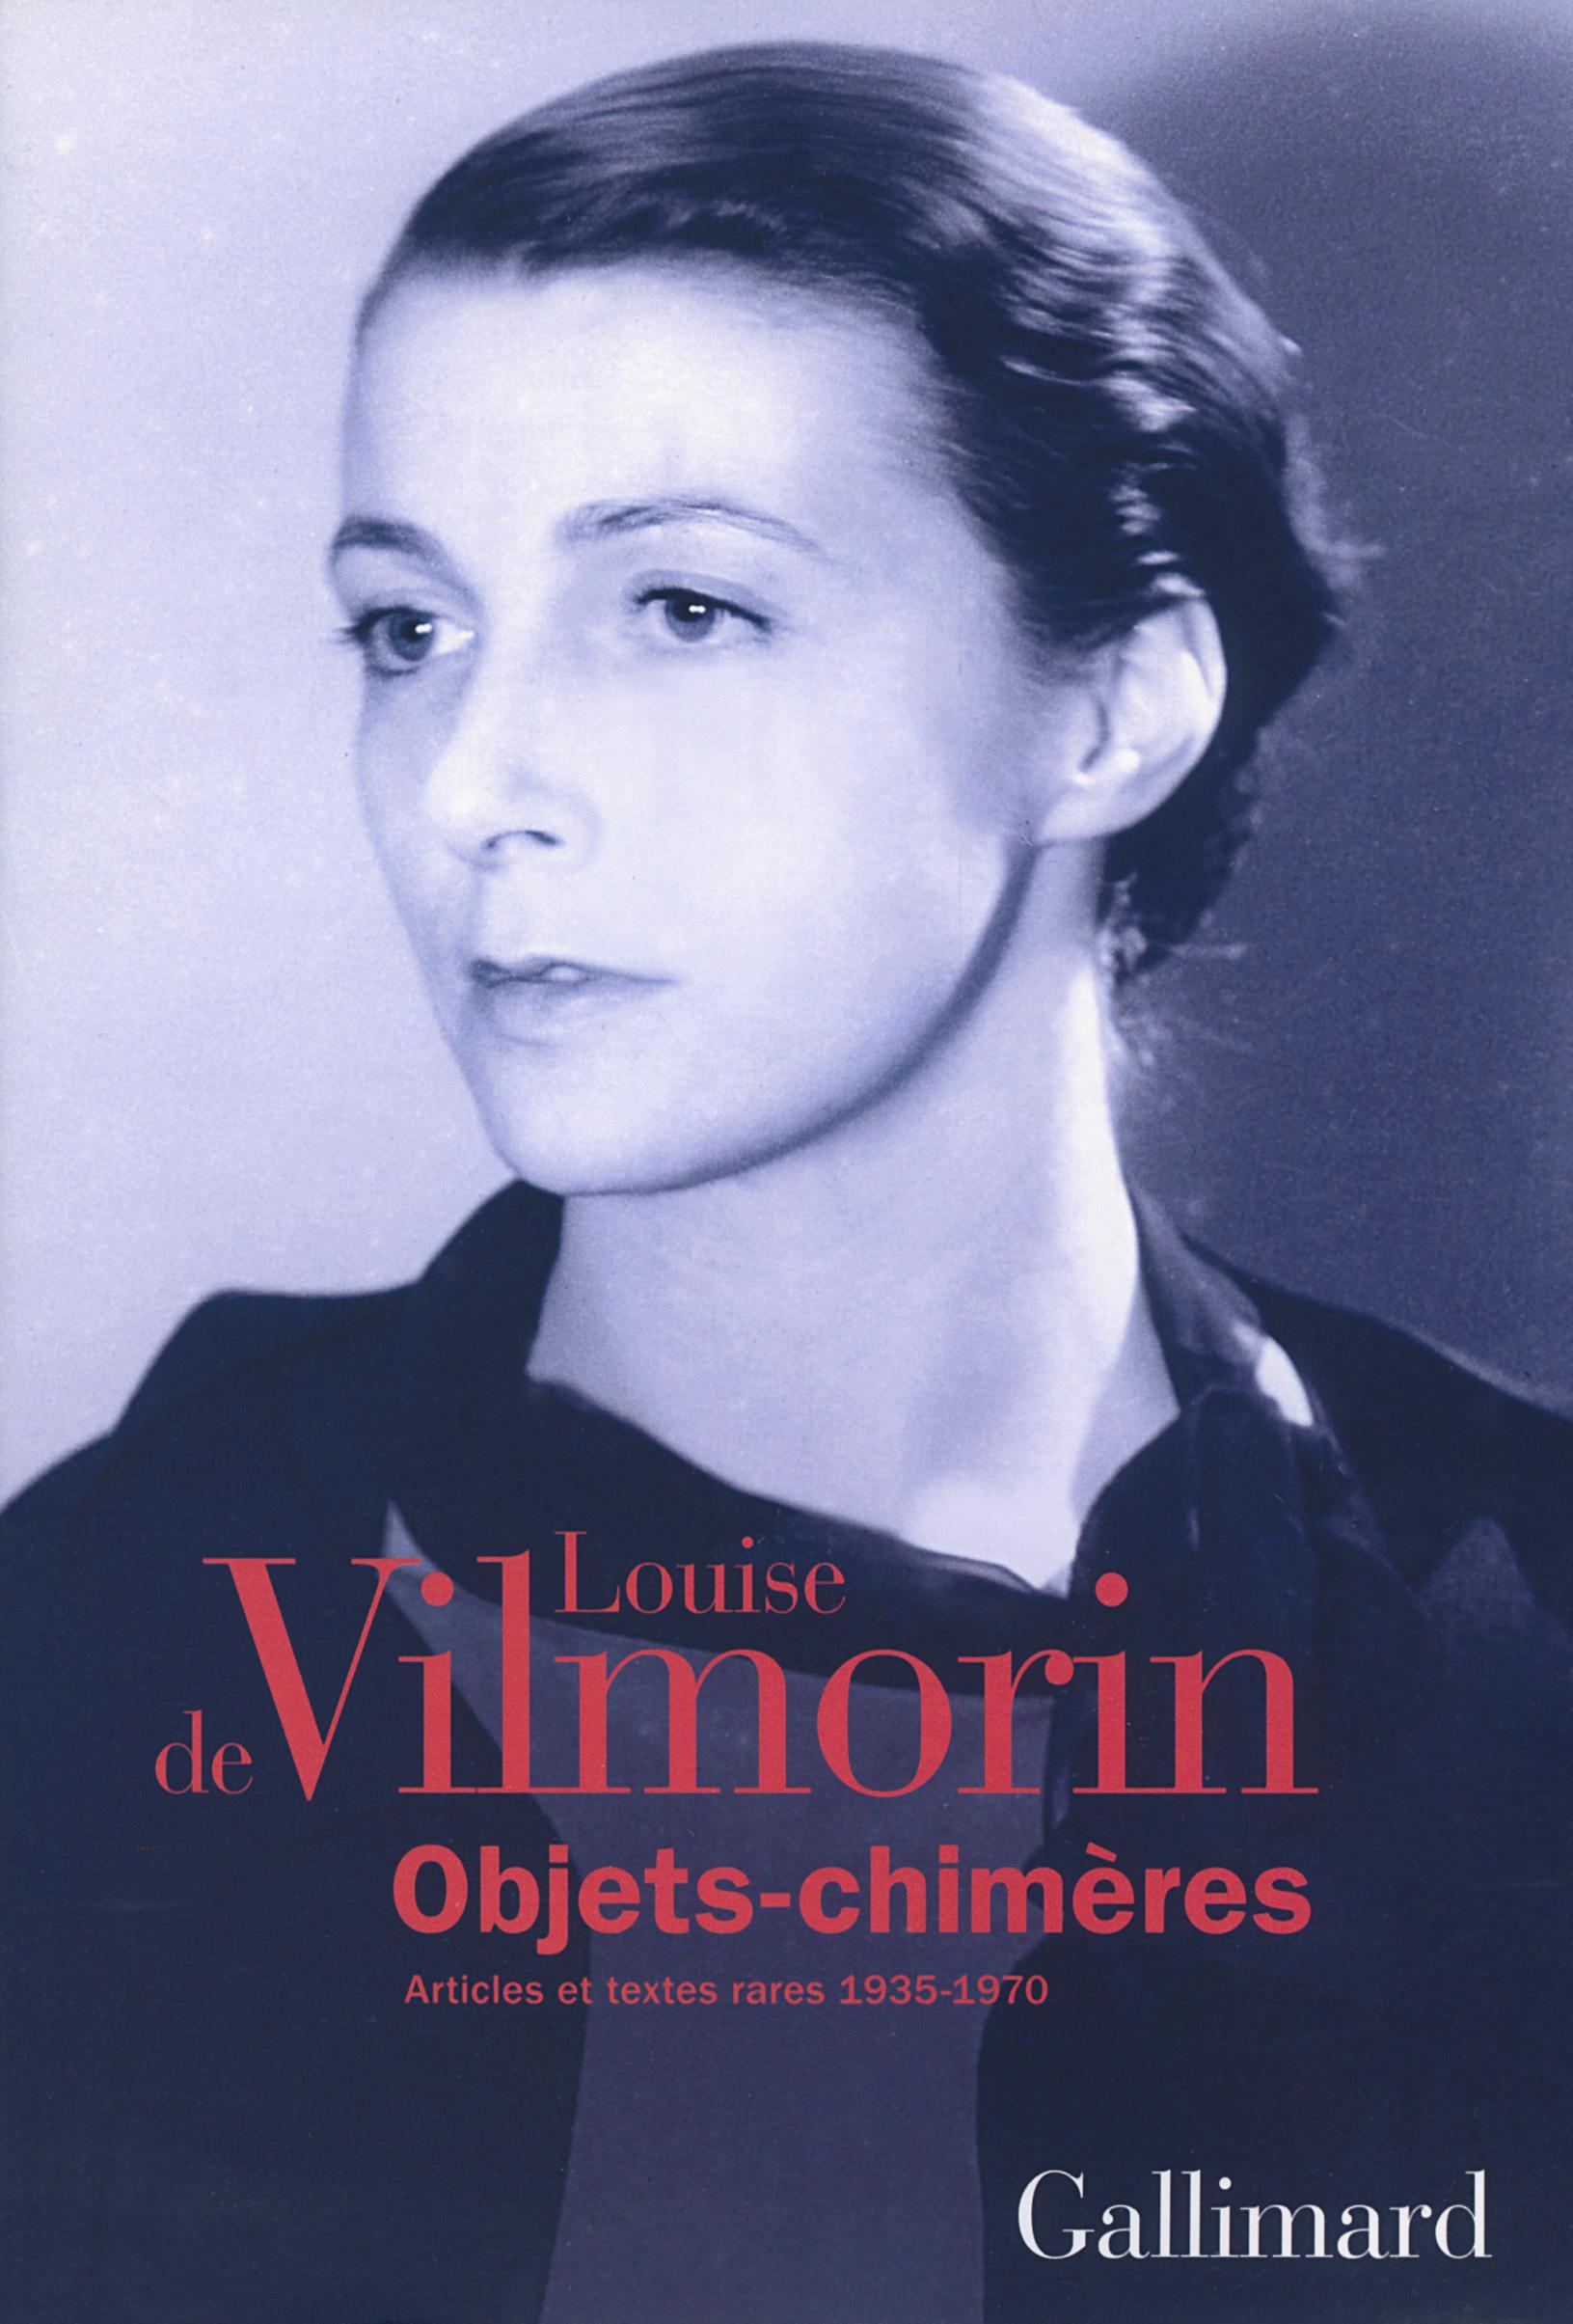 OBJETS-CHIMERES ARTICLES ET TEXTES RARES,1935-1970